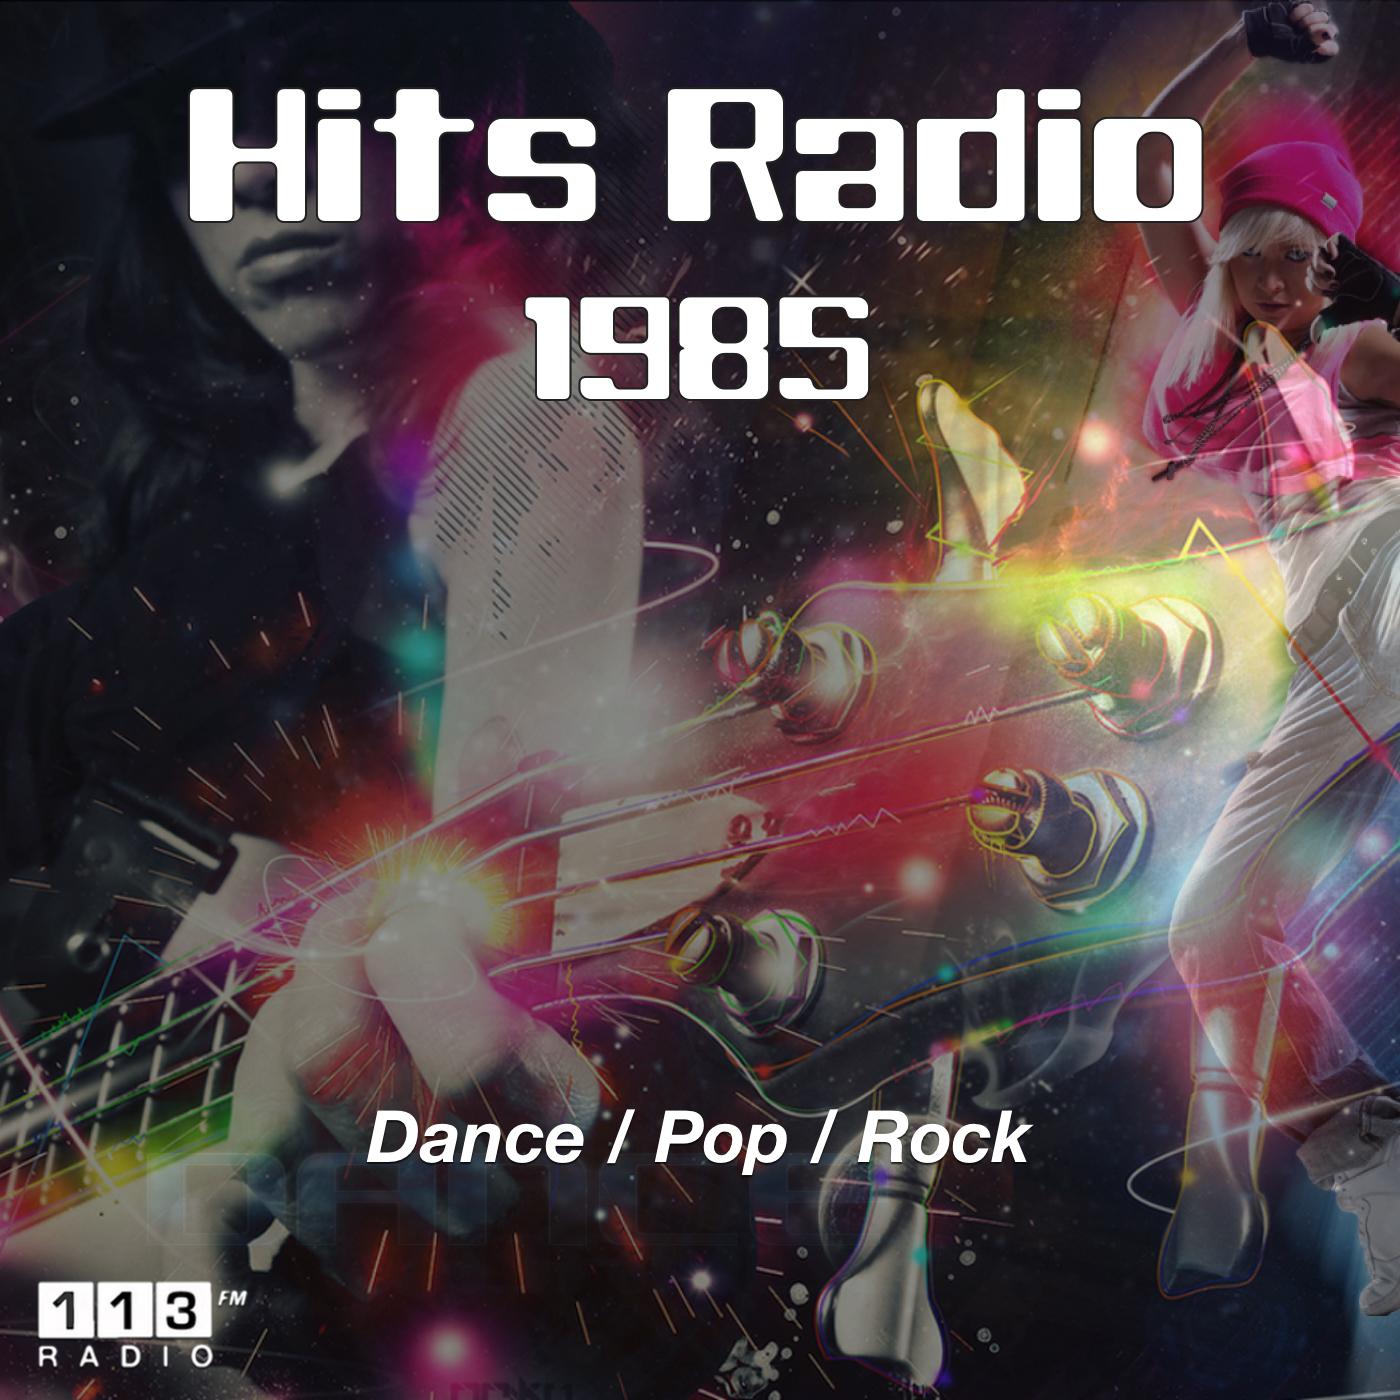 113.fm Hits Radio - 1985